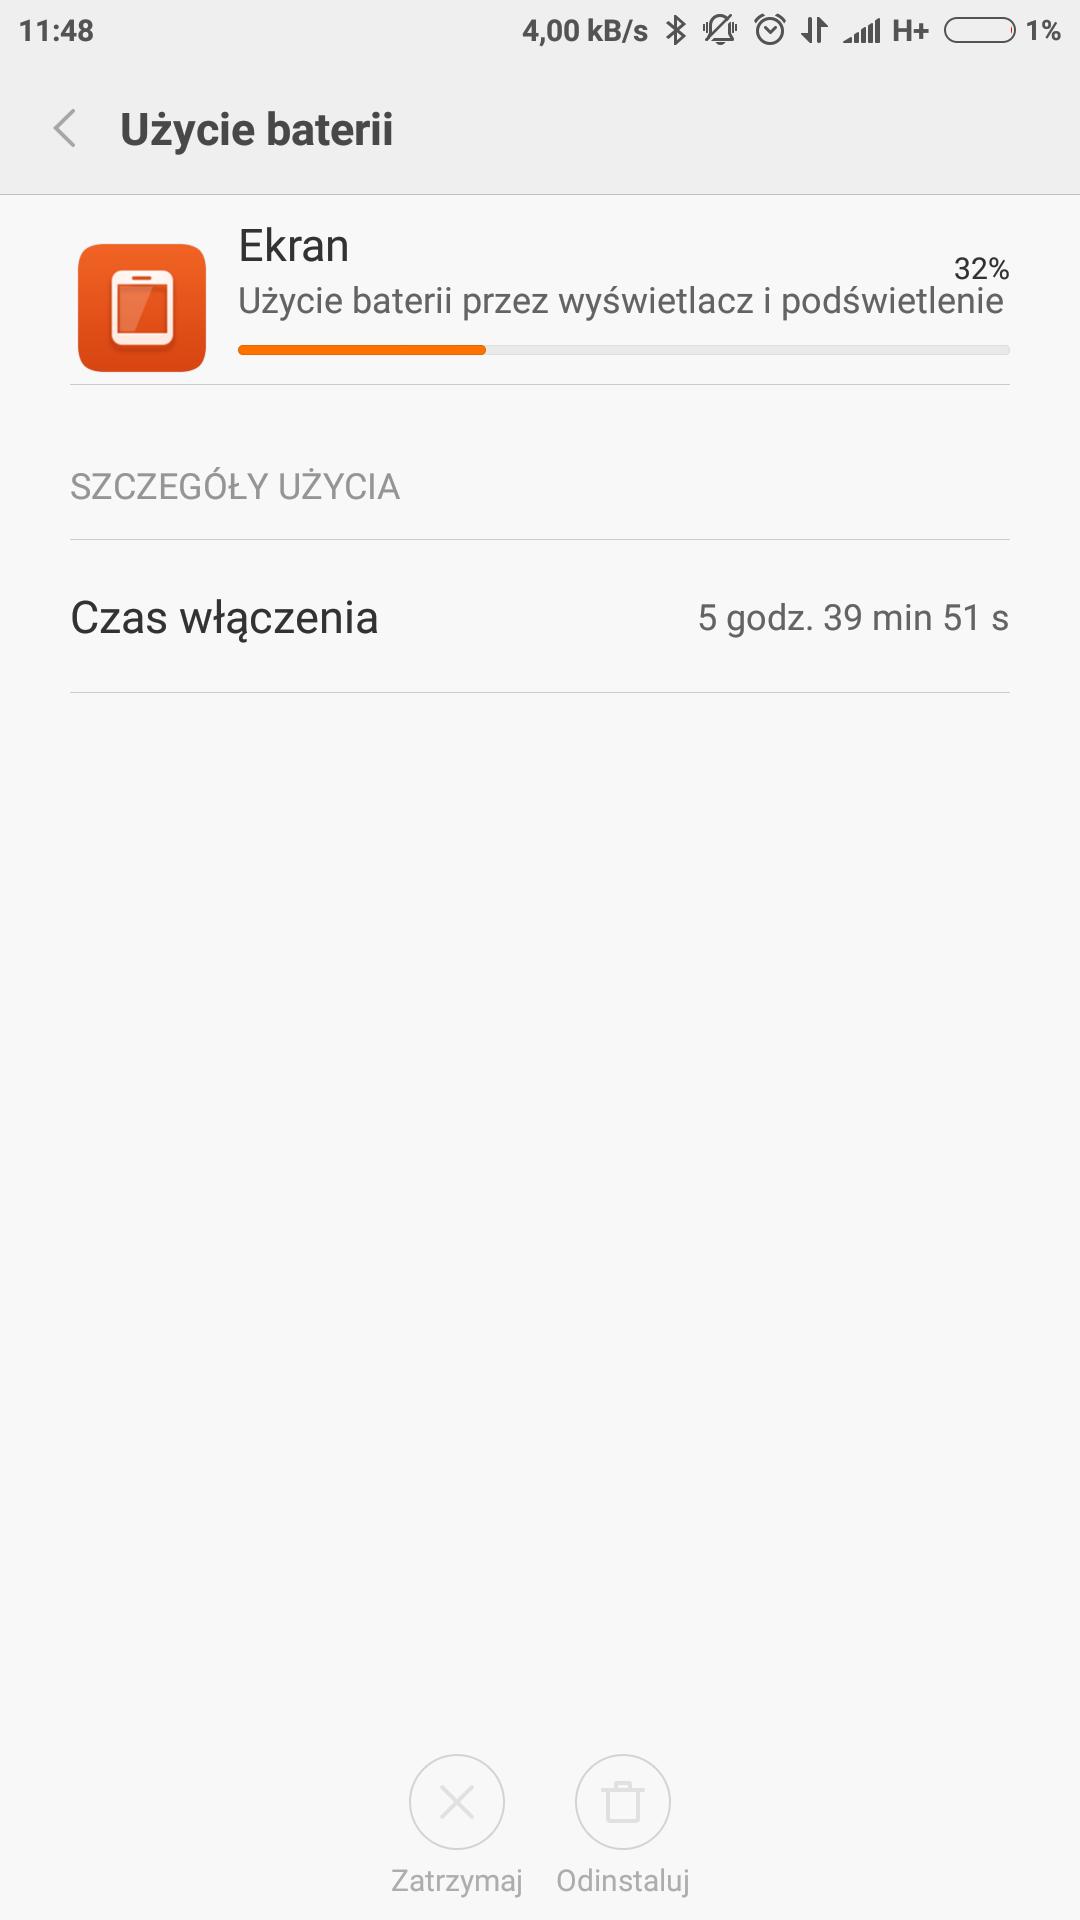 2b117edc6d22d7a320892c01f1173780.jpg